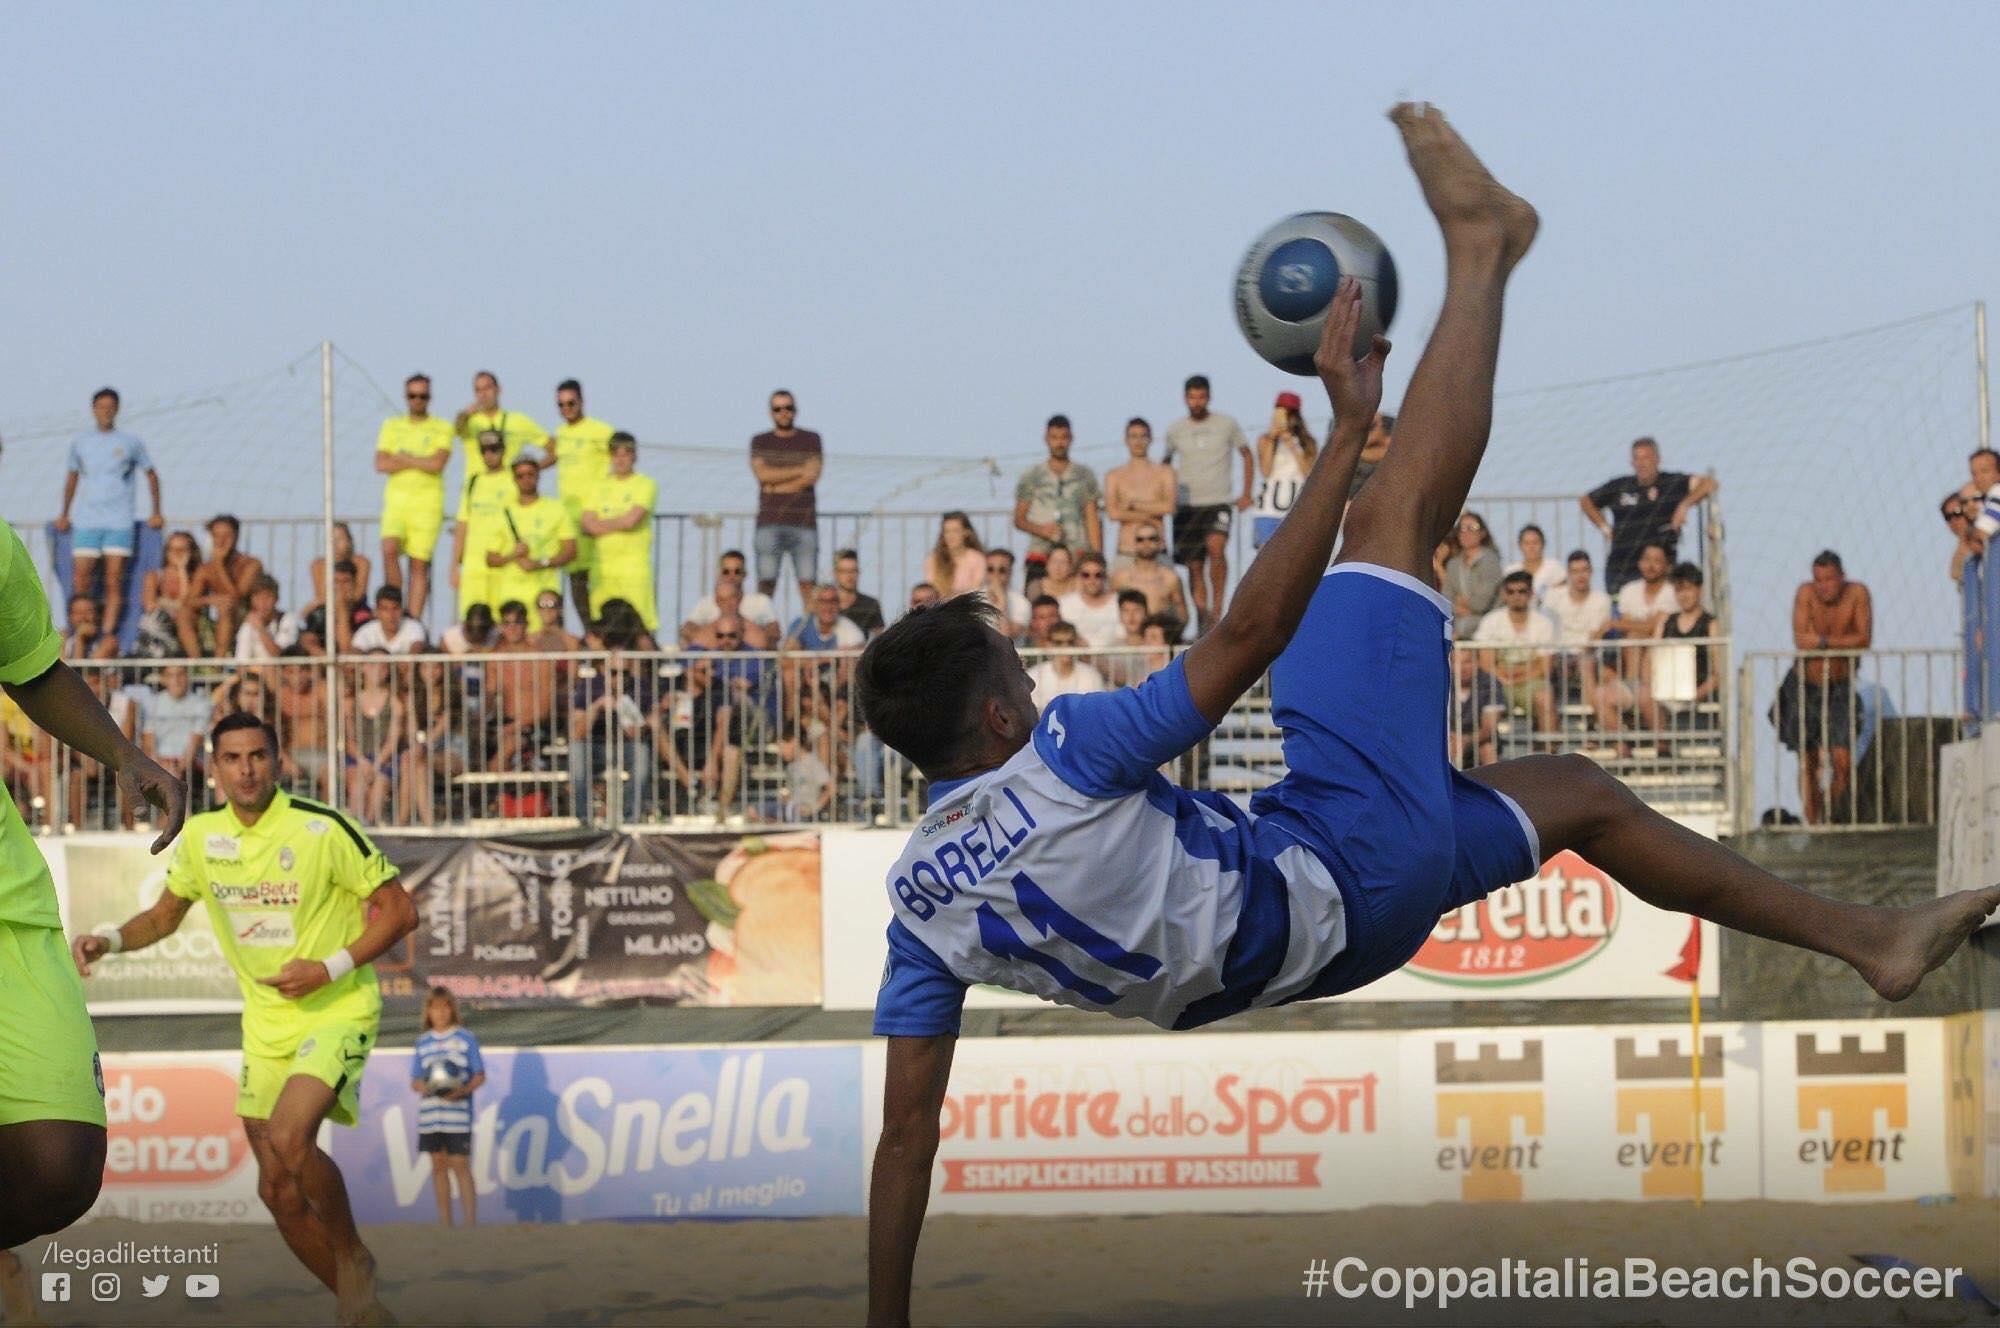 Simone Borelli in Nazionale di beach soccer. anxur time